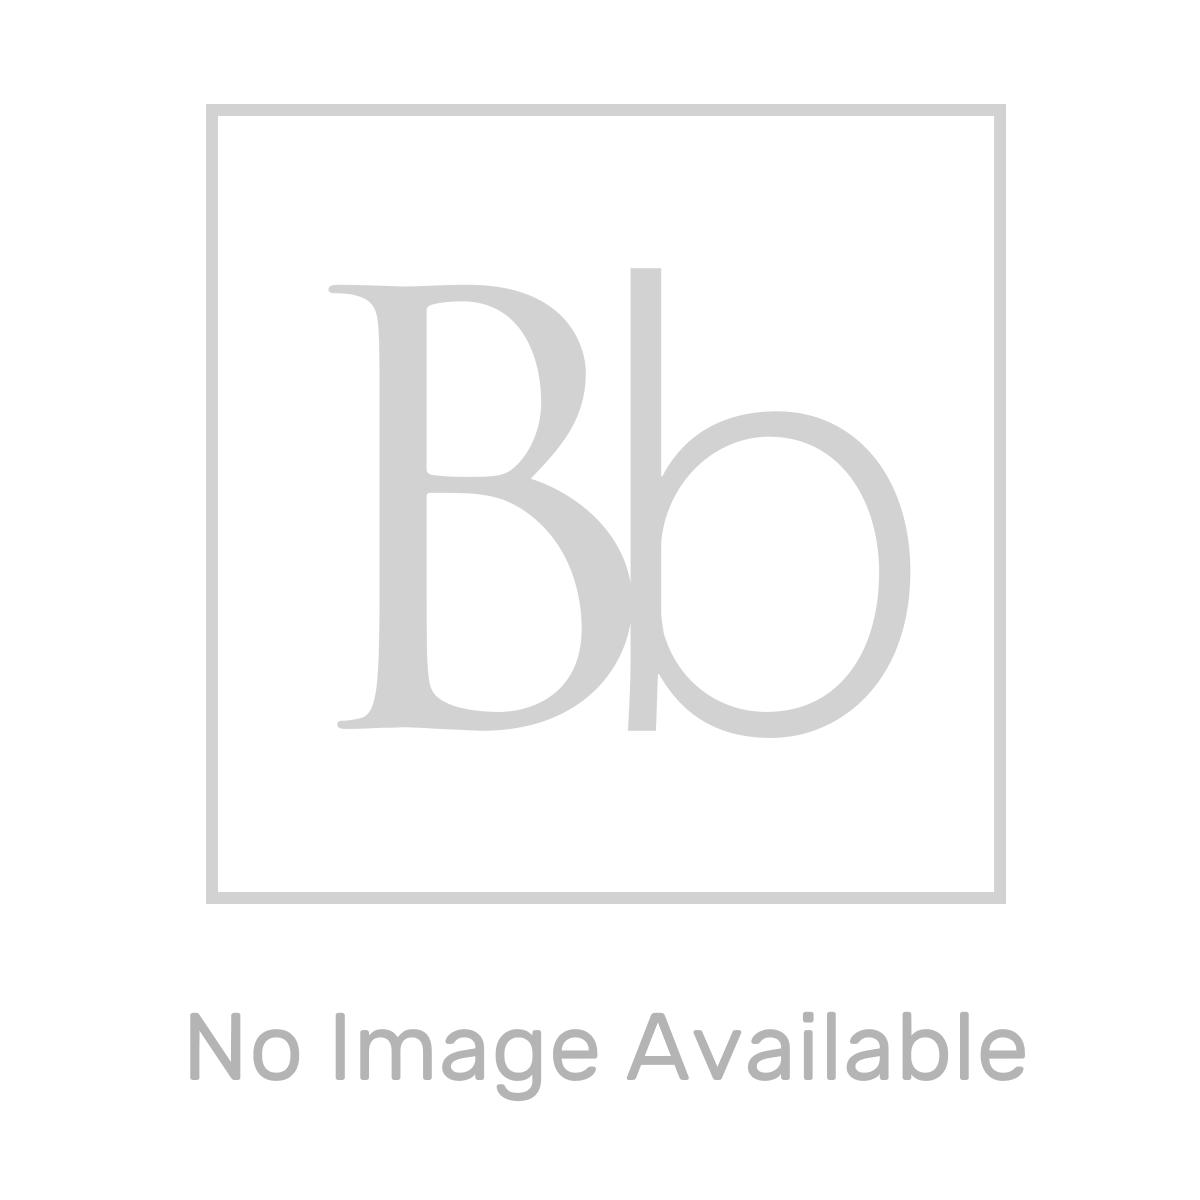 Nuie Quattro Square L Shaped Bath Screen Dimensions